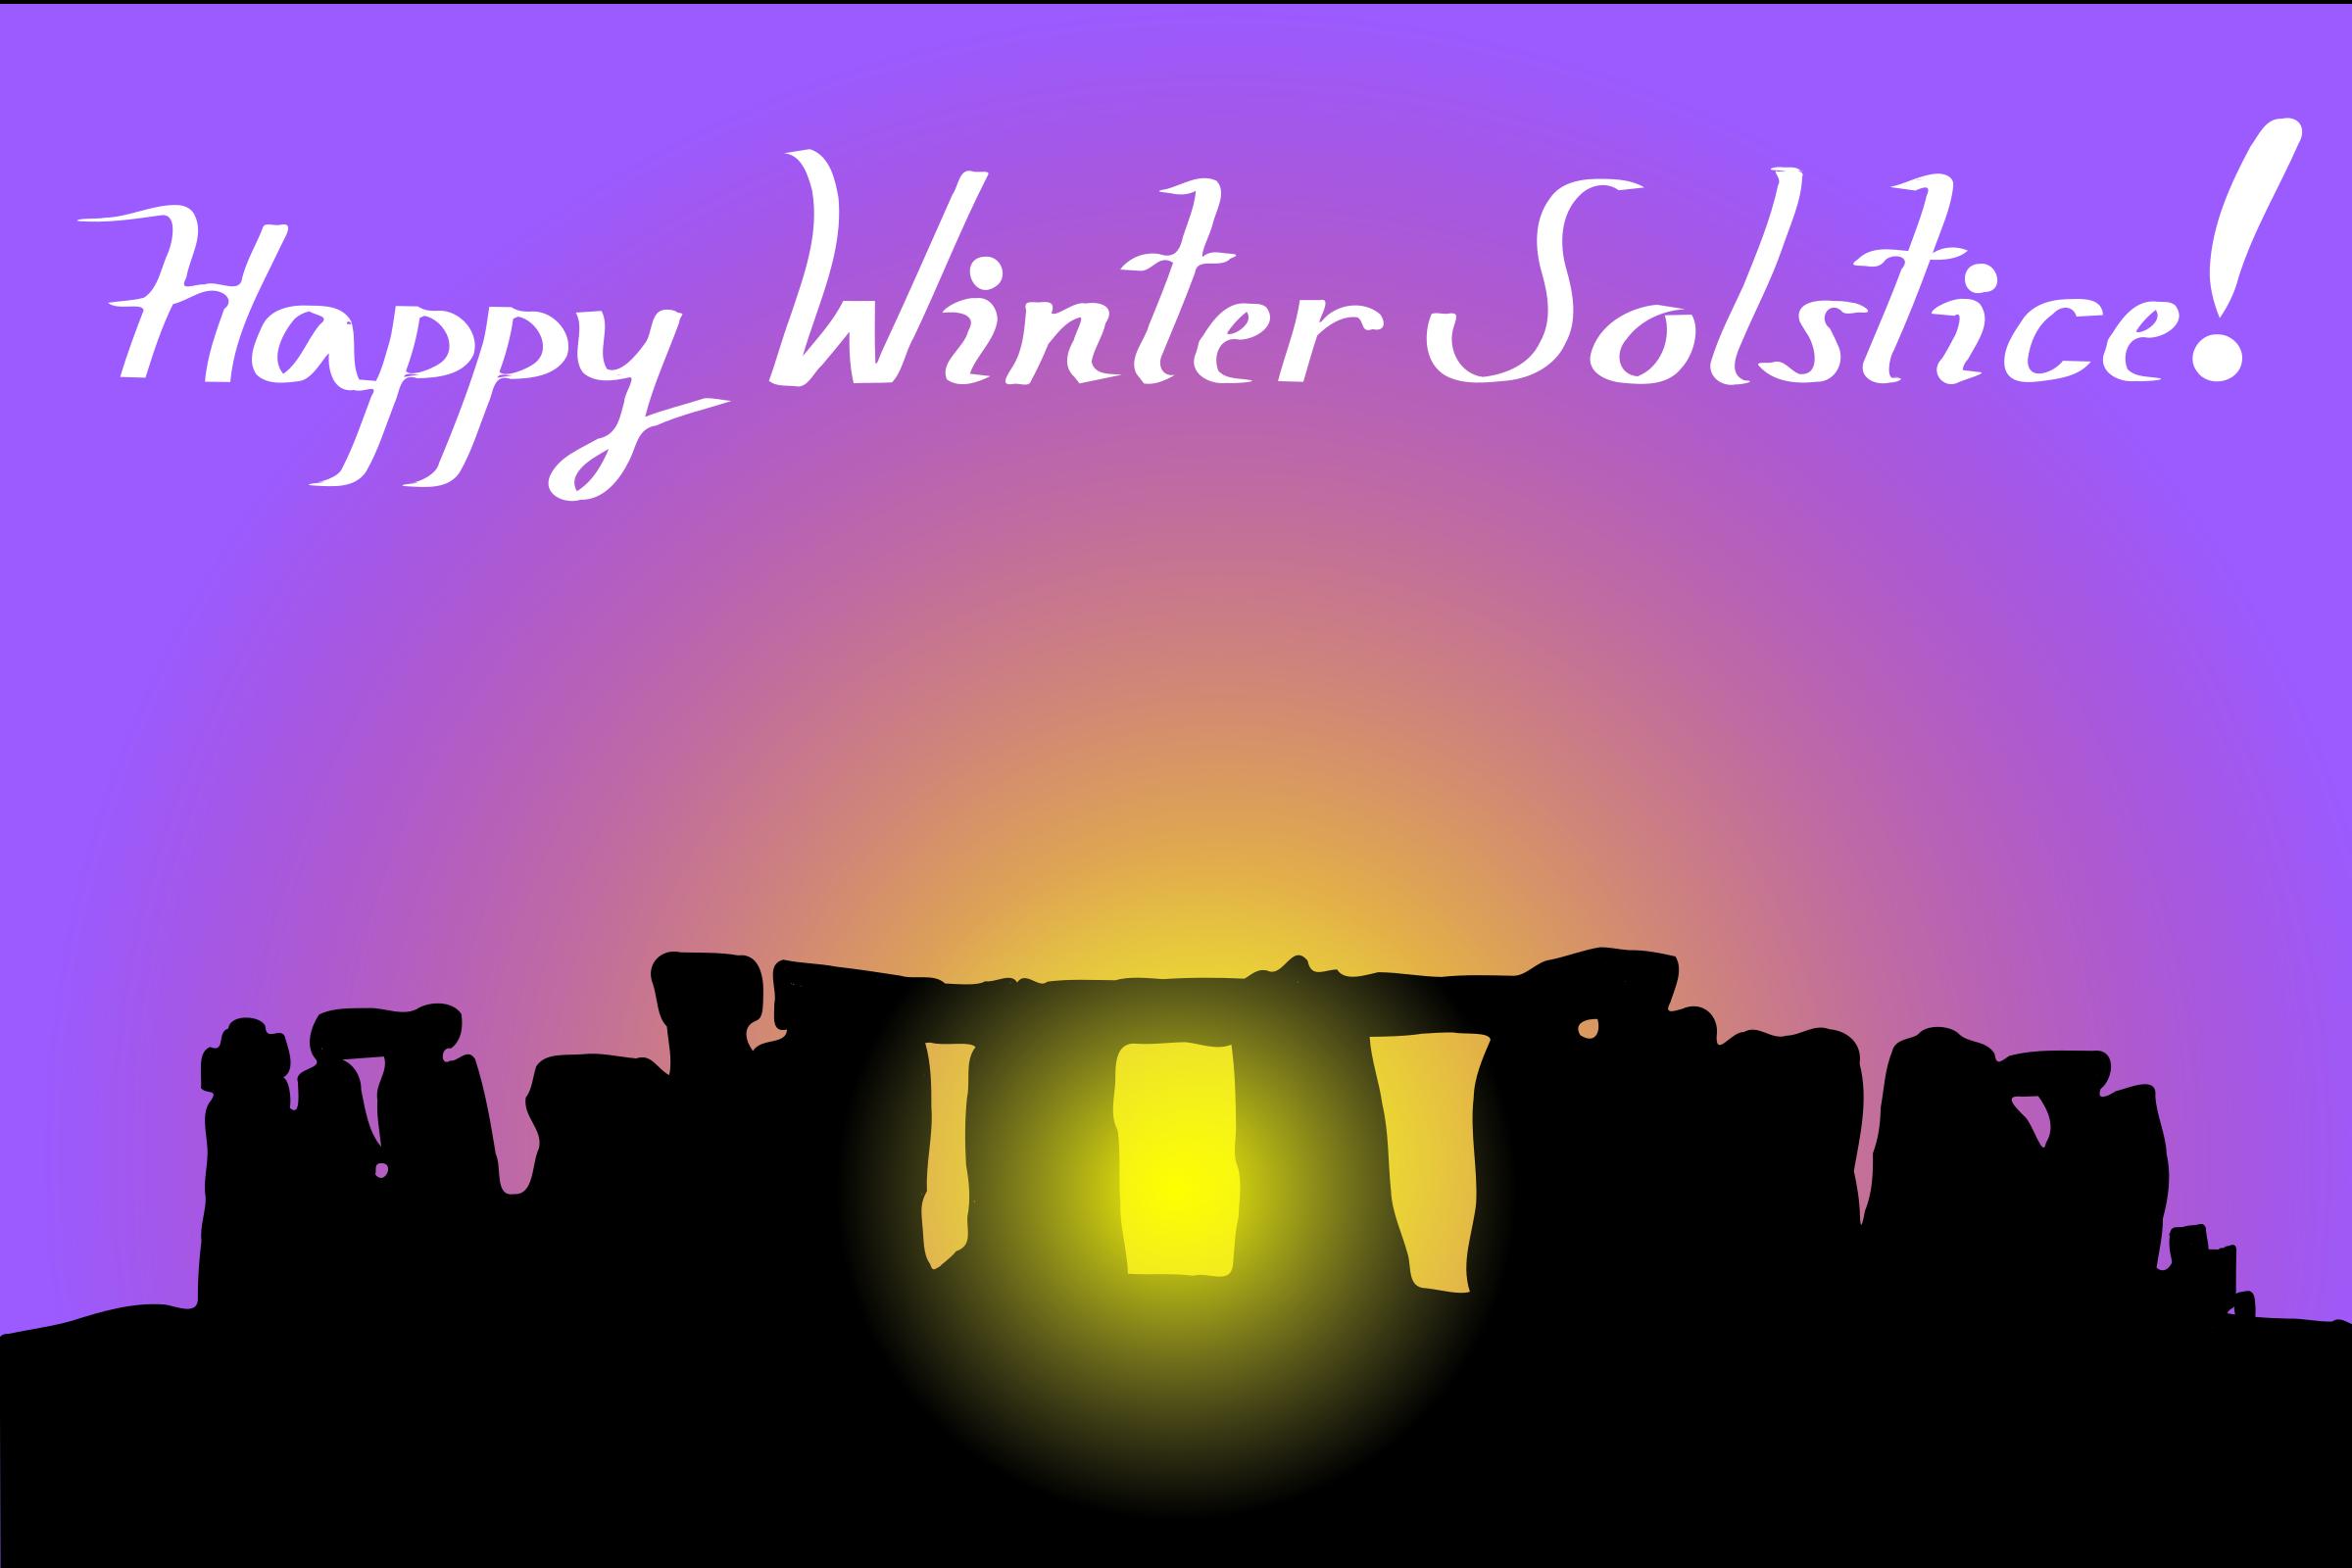 Happy big image png. 2017 clipart winter solstice